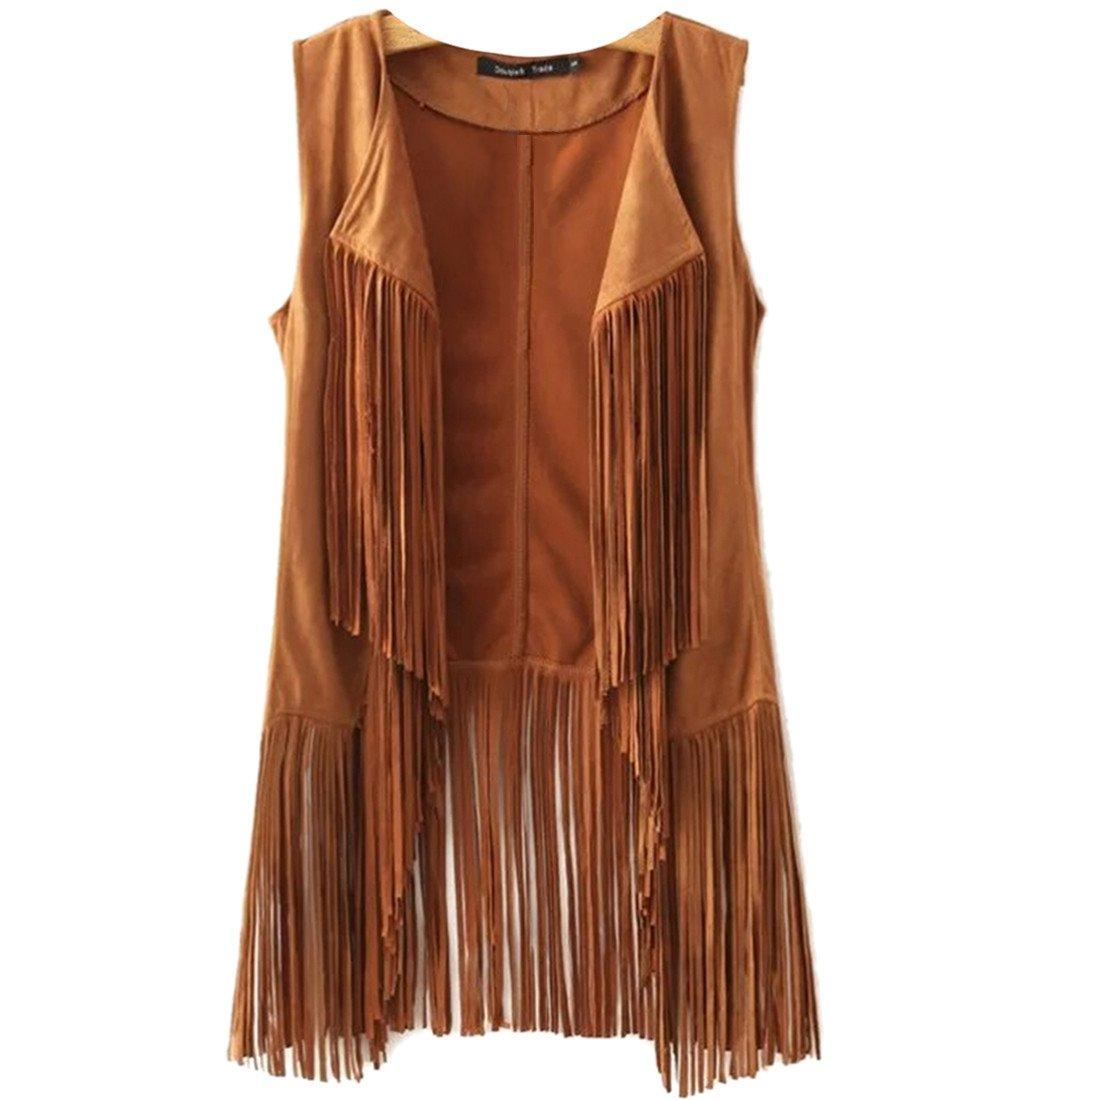 New Tassels Fringe Sleeveless Suede Vest Cardigan Waistcoat Jacket Outwear Tops,Khaki,Medium